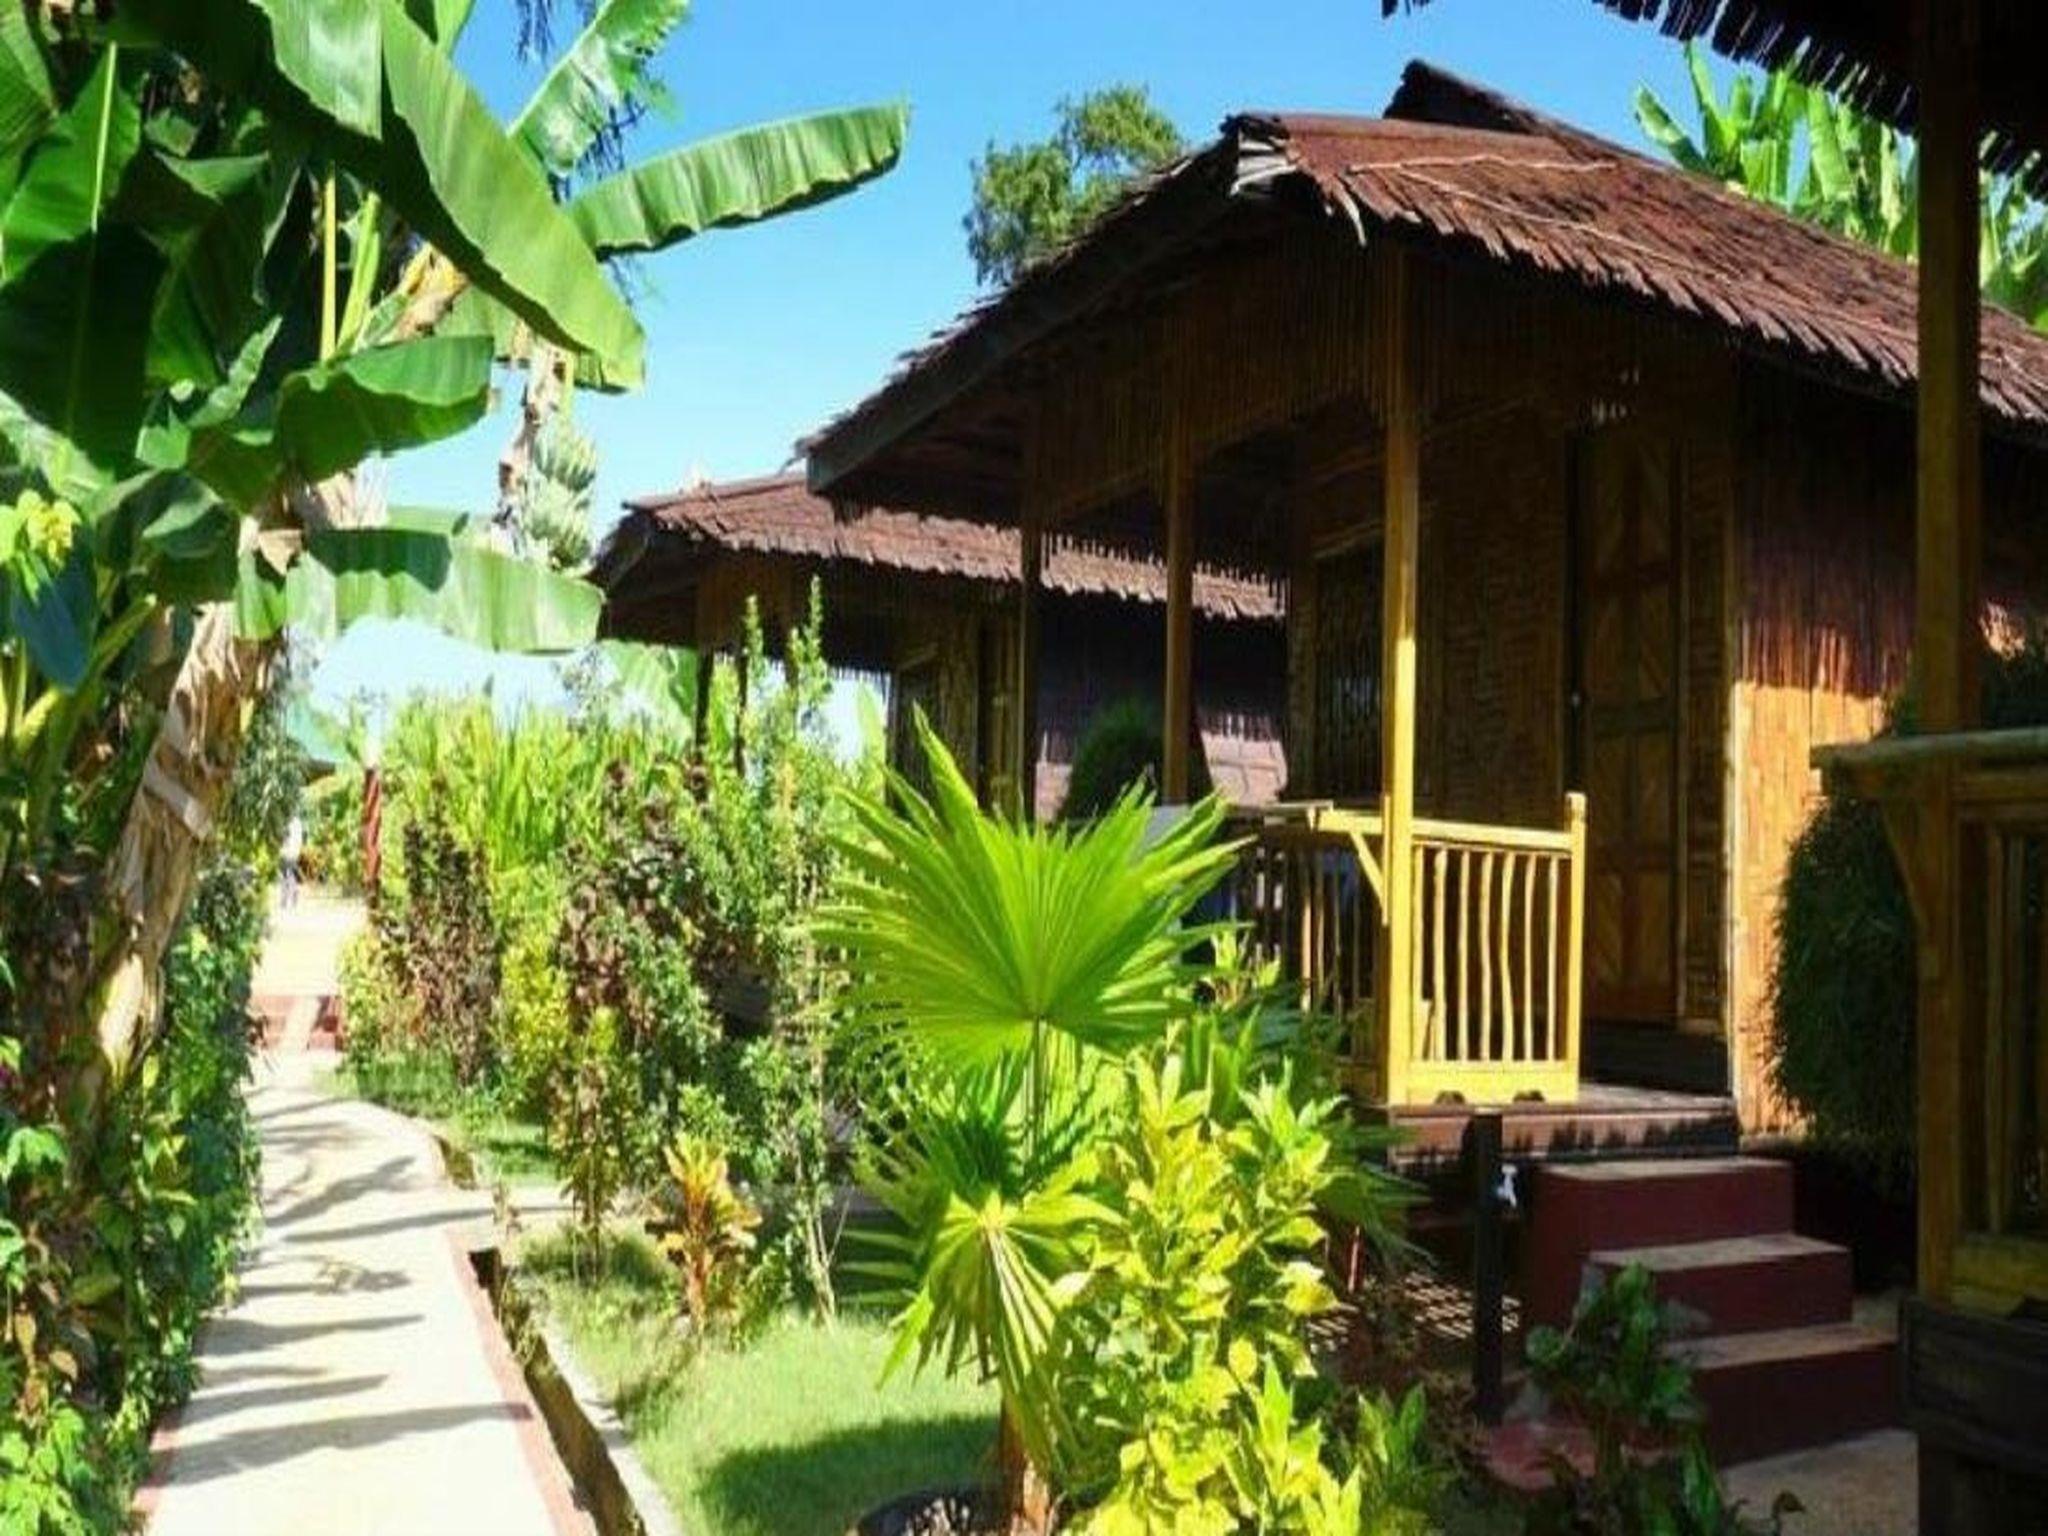 Chaungtha Beach Hill Garden Hotel Myanmar, Asia Ideally located in ...